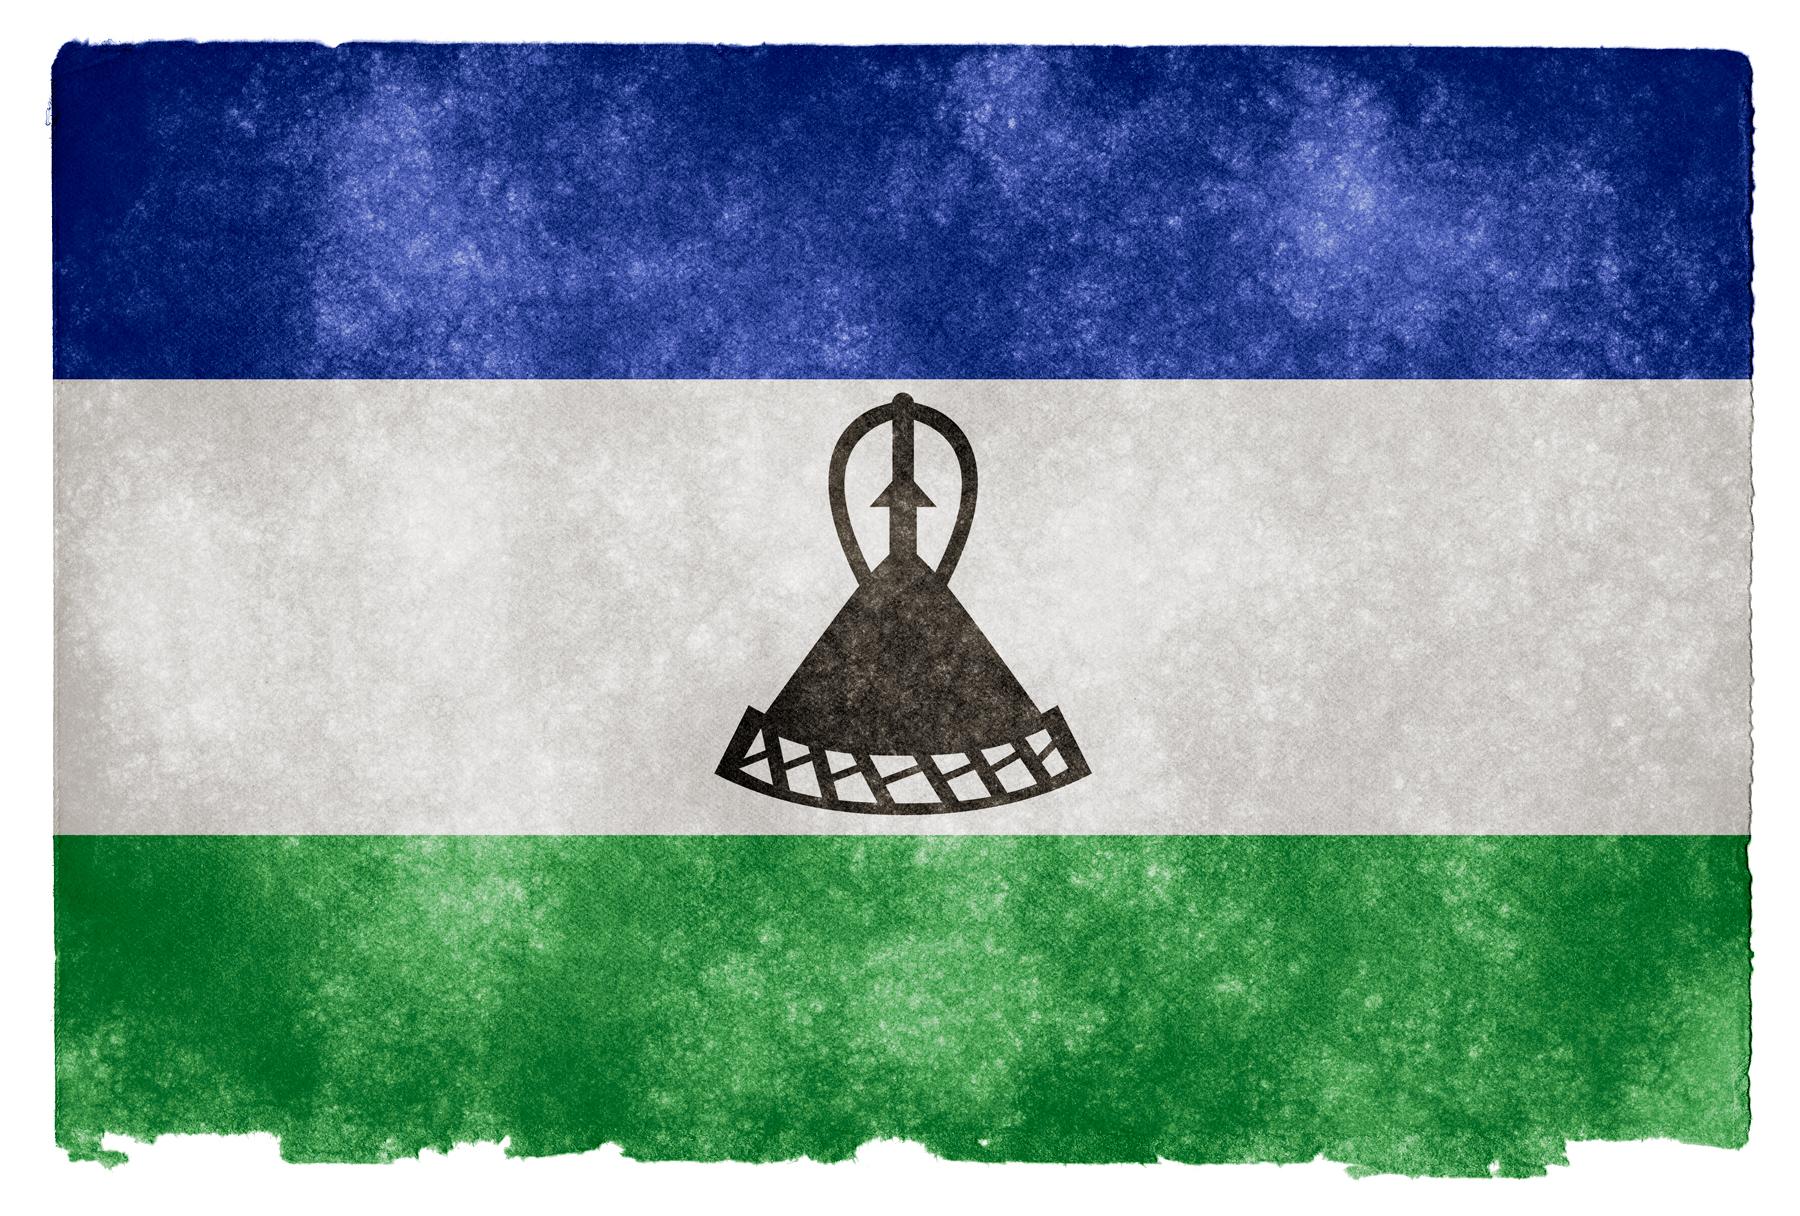 Lesotho Grunge Flag, Africa, Resource, Nation, National, HQ Photo